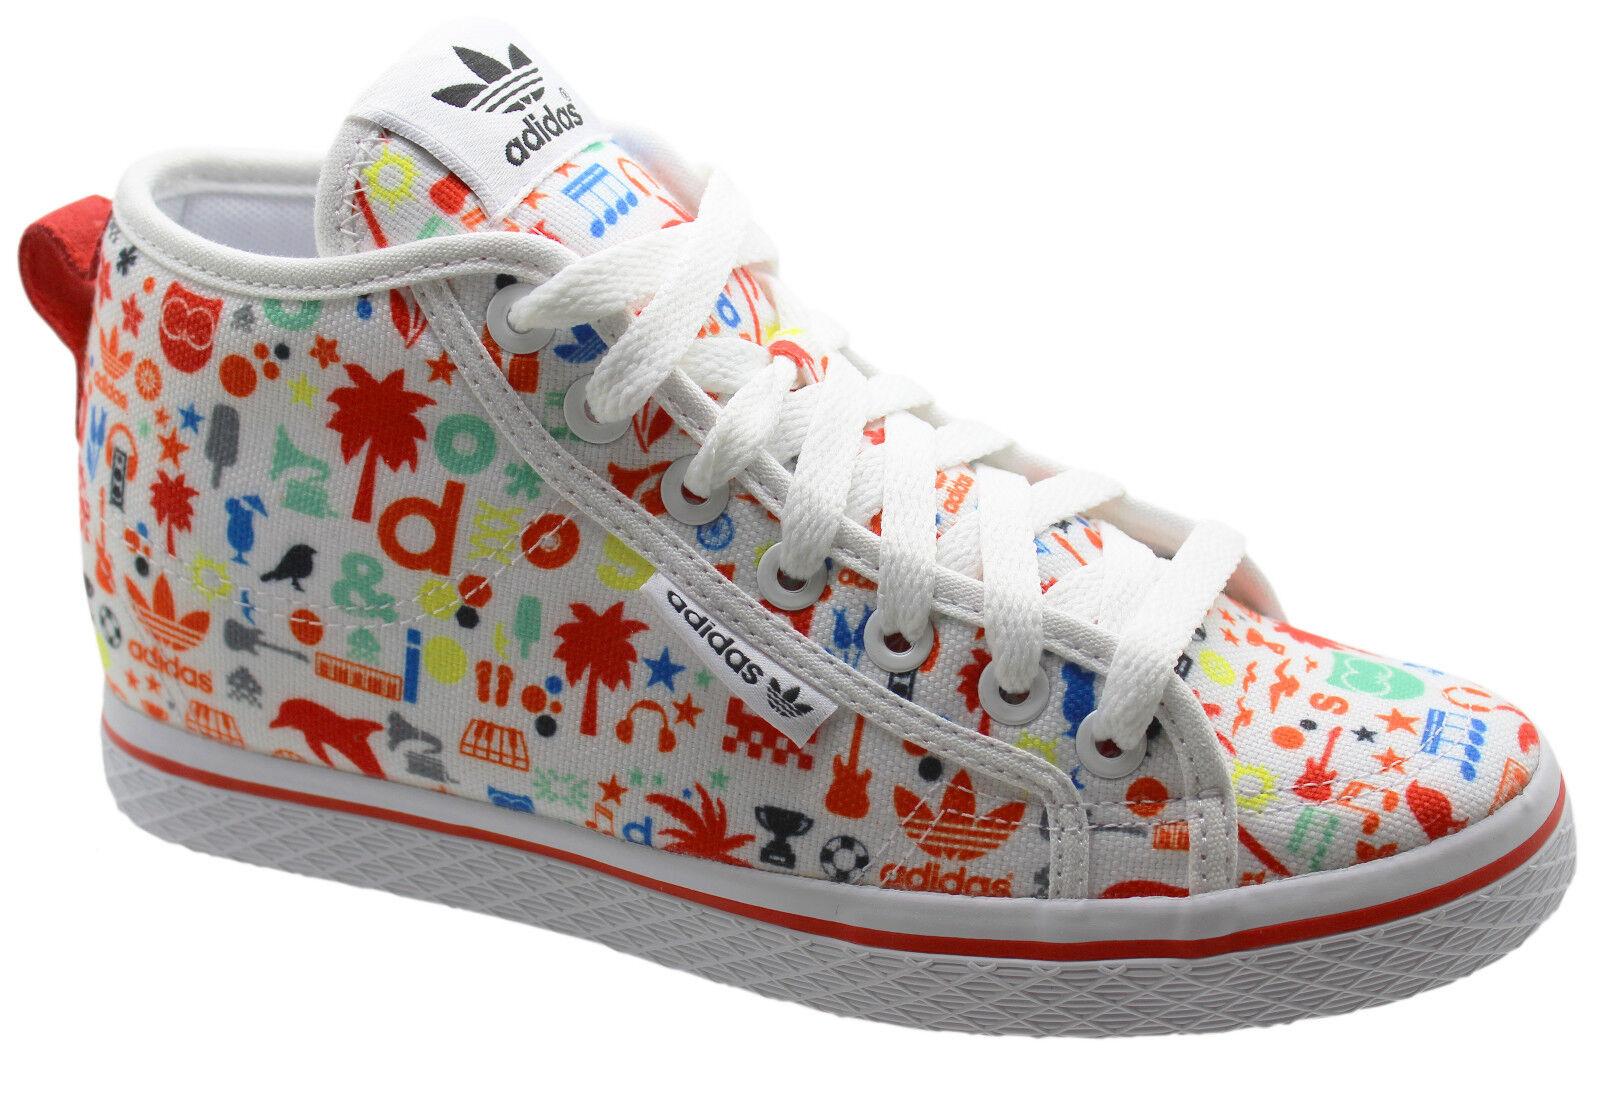 Adidas Graffiti Originales Miel Up W Graffiti Adidas Cuña Zapatillas Zapatos para mujeres B34043 U39 a39be6